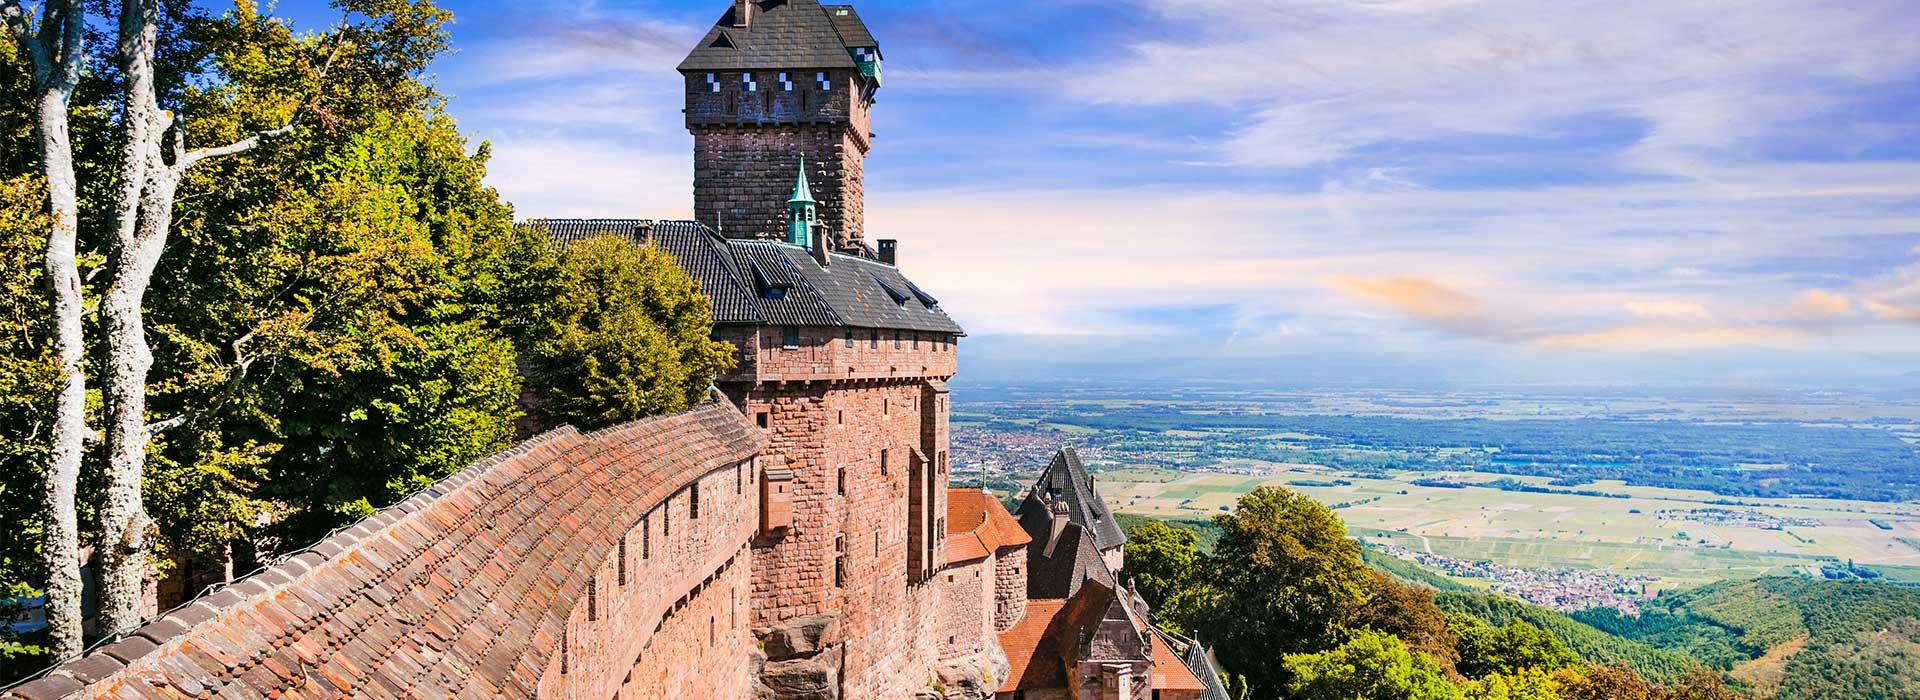 Alsace, Escapade, France_Alsace_Haut-Koenigsbourg